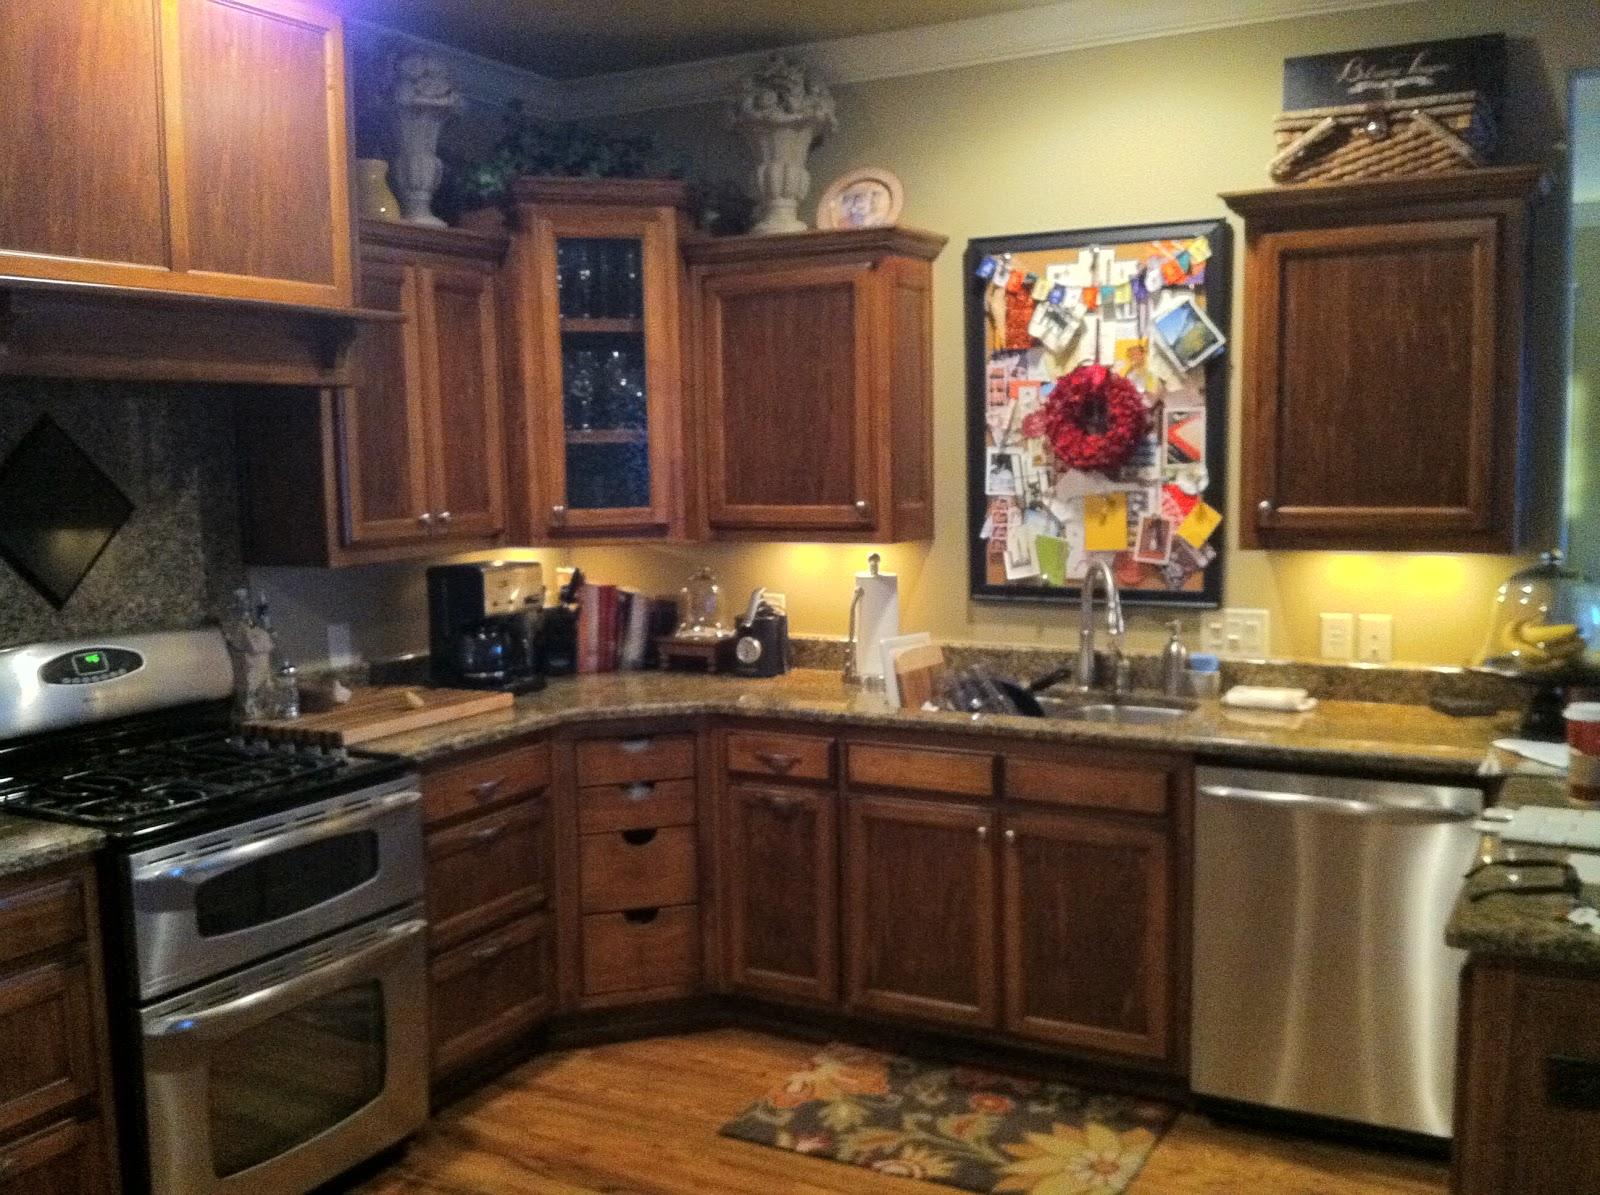 Depósito Santa Mariah: Cozinha Renovada! #AF881C 1600 1195